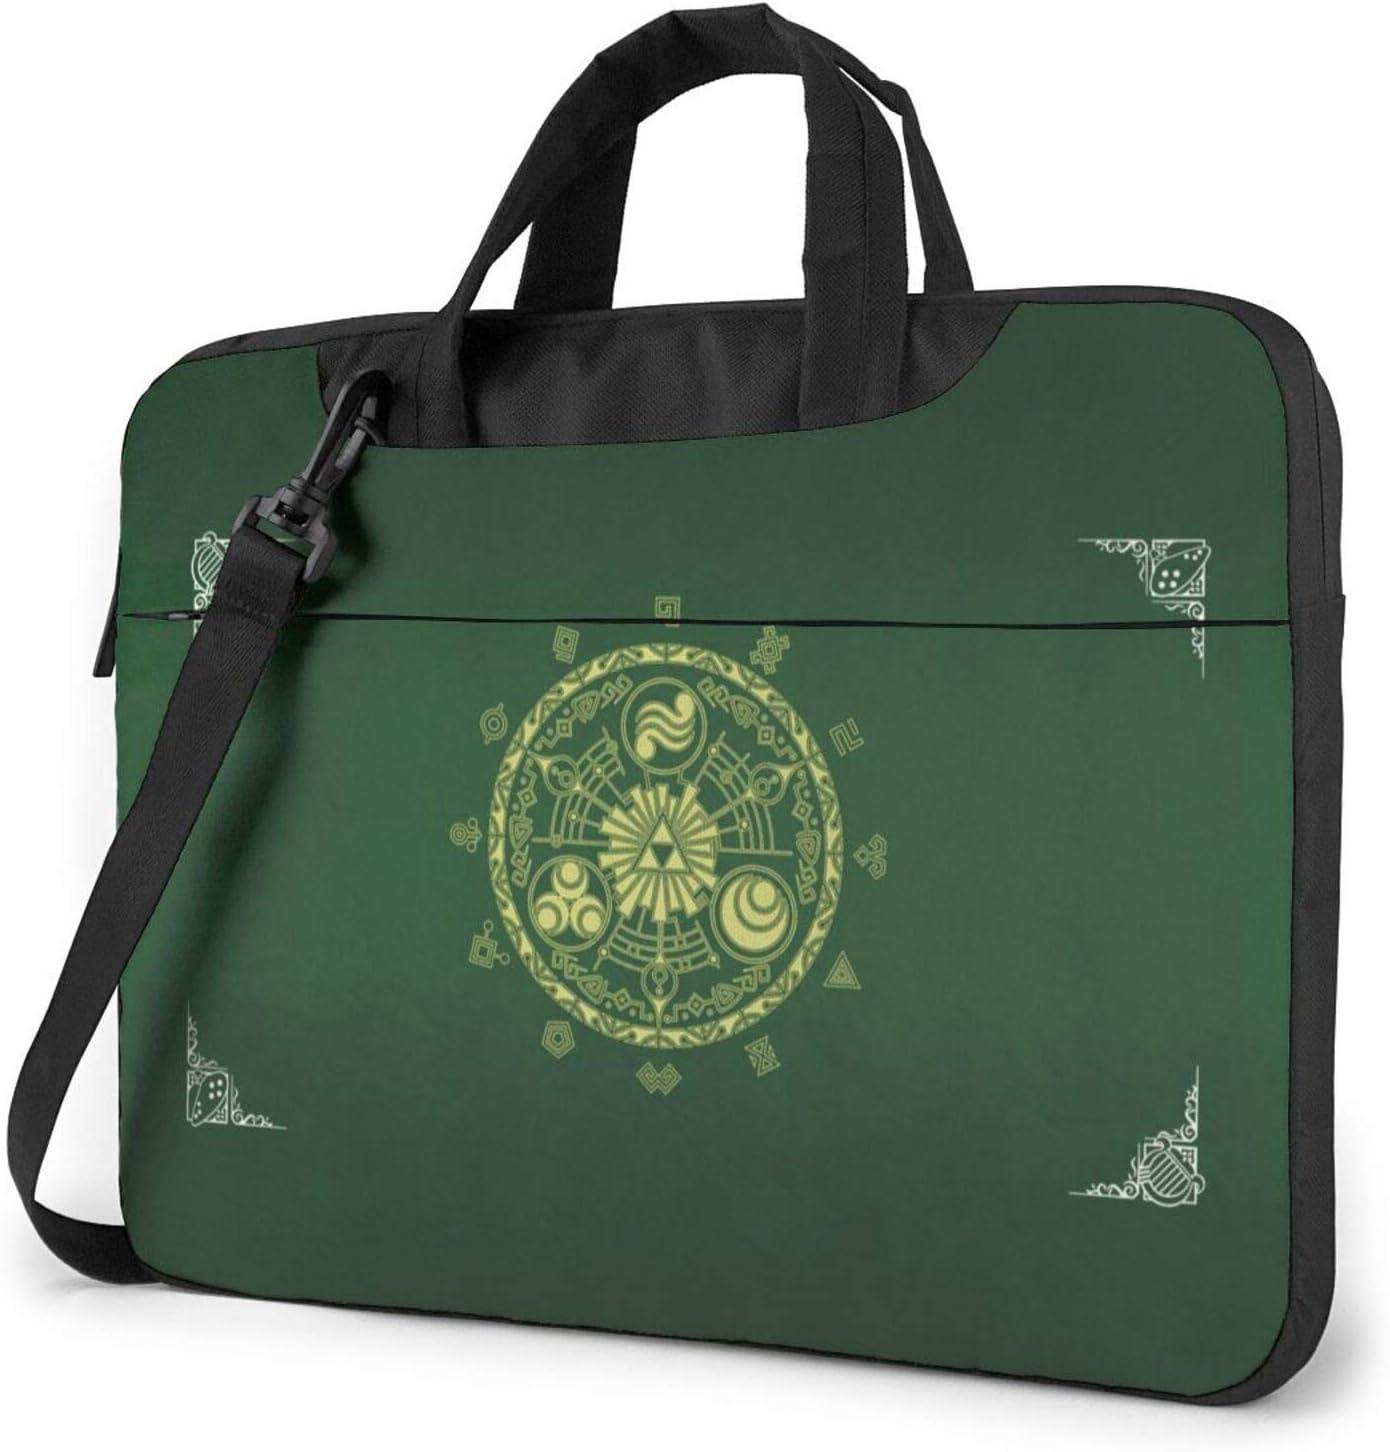 Le-Gend of Zelda Laptop Shoulder Messenger Bag Case Sleeve for 13 Inch 14 Inch Laptop Case Laptop Briefcase 15.6 Inch for Business Casual or School Case for MacBook AIR PRO